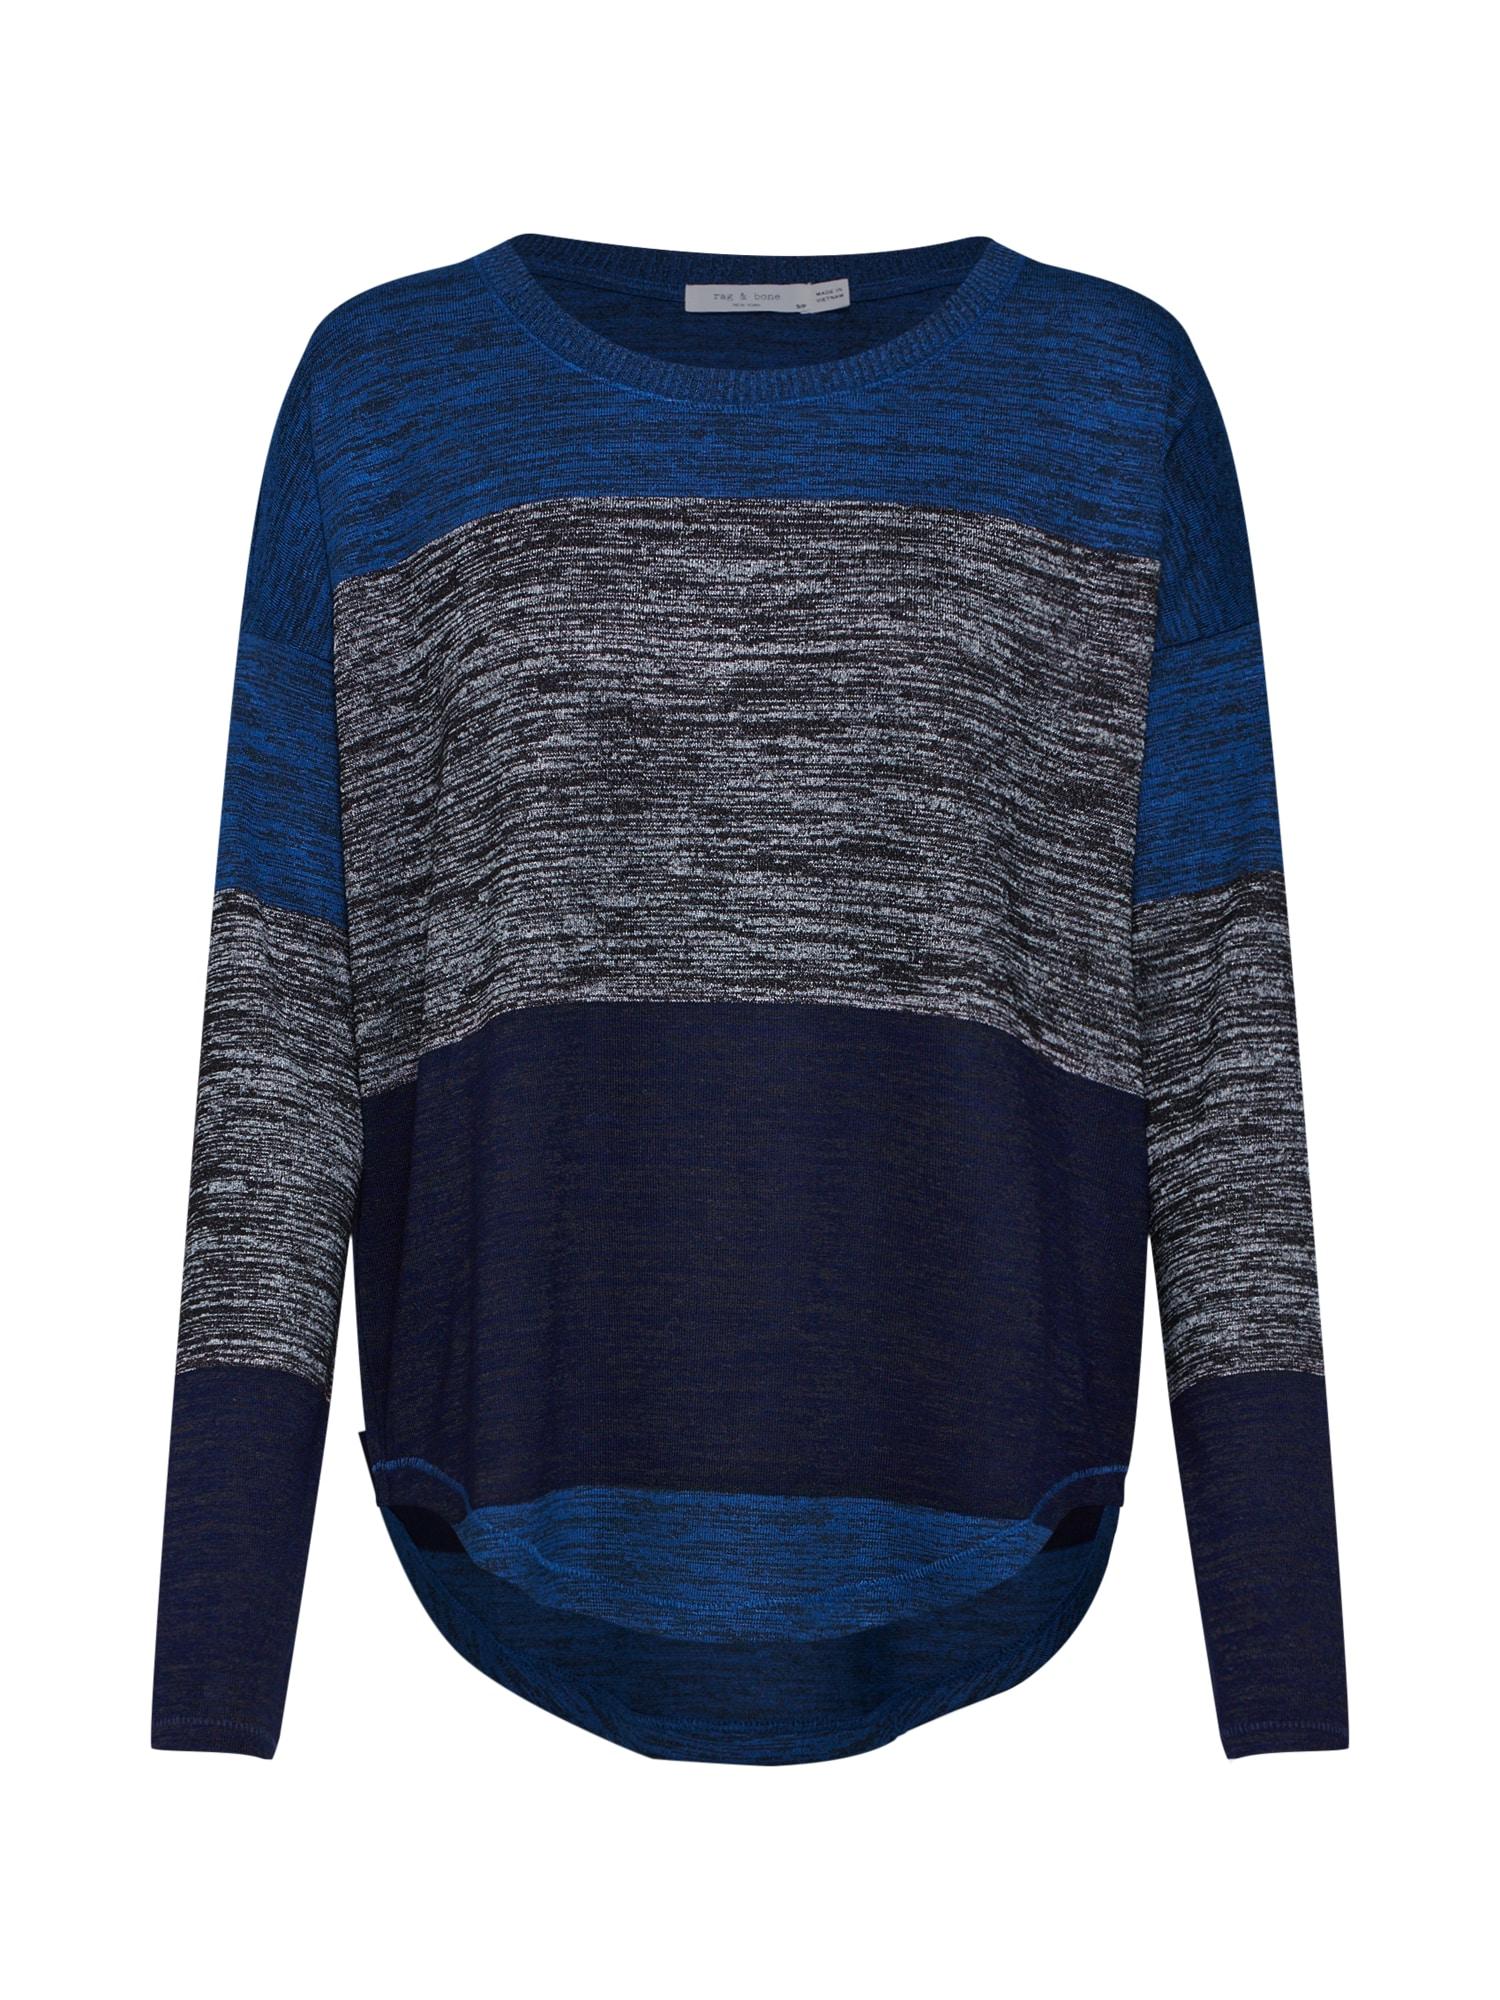 Svetr Stripe Hudson modrá tmavě šedá Rag & Bone